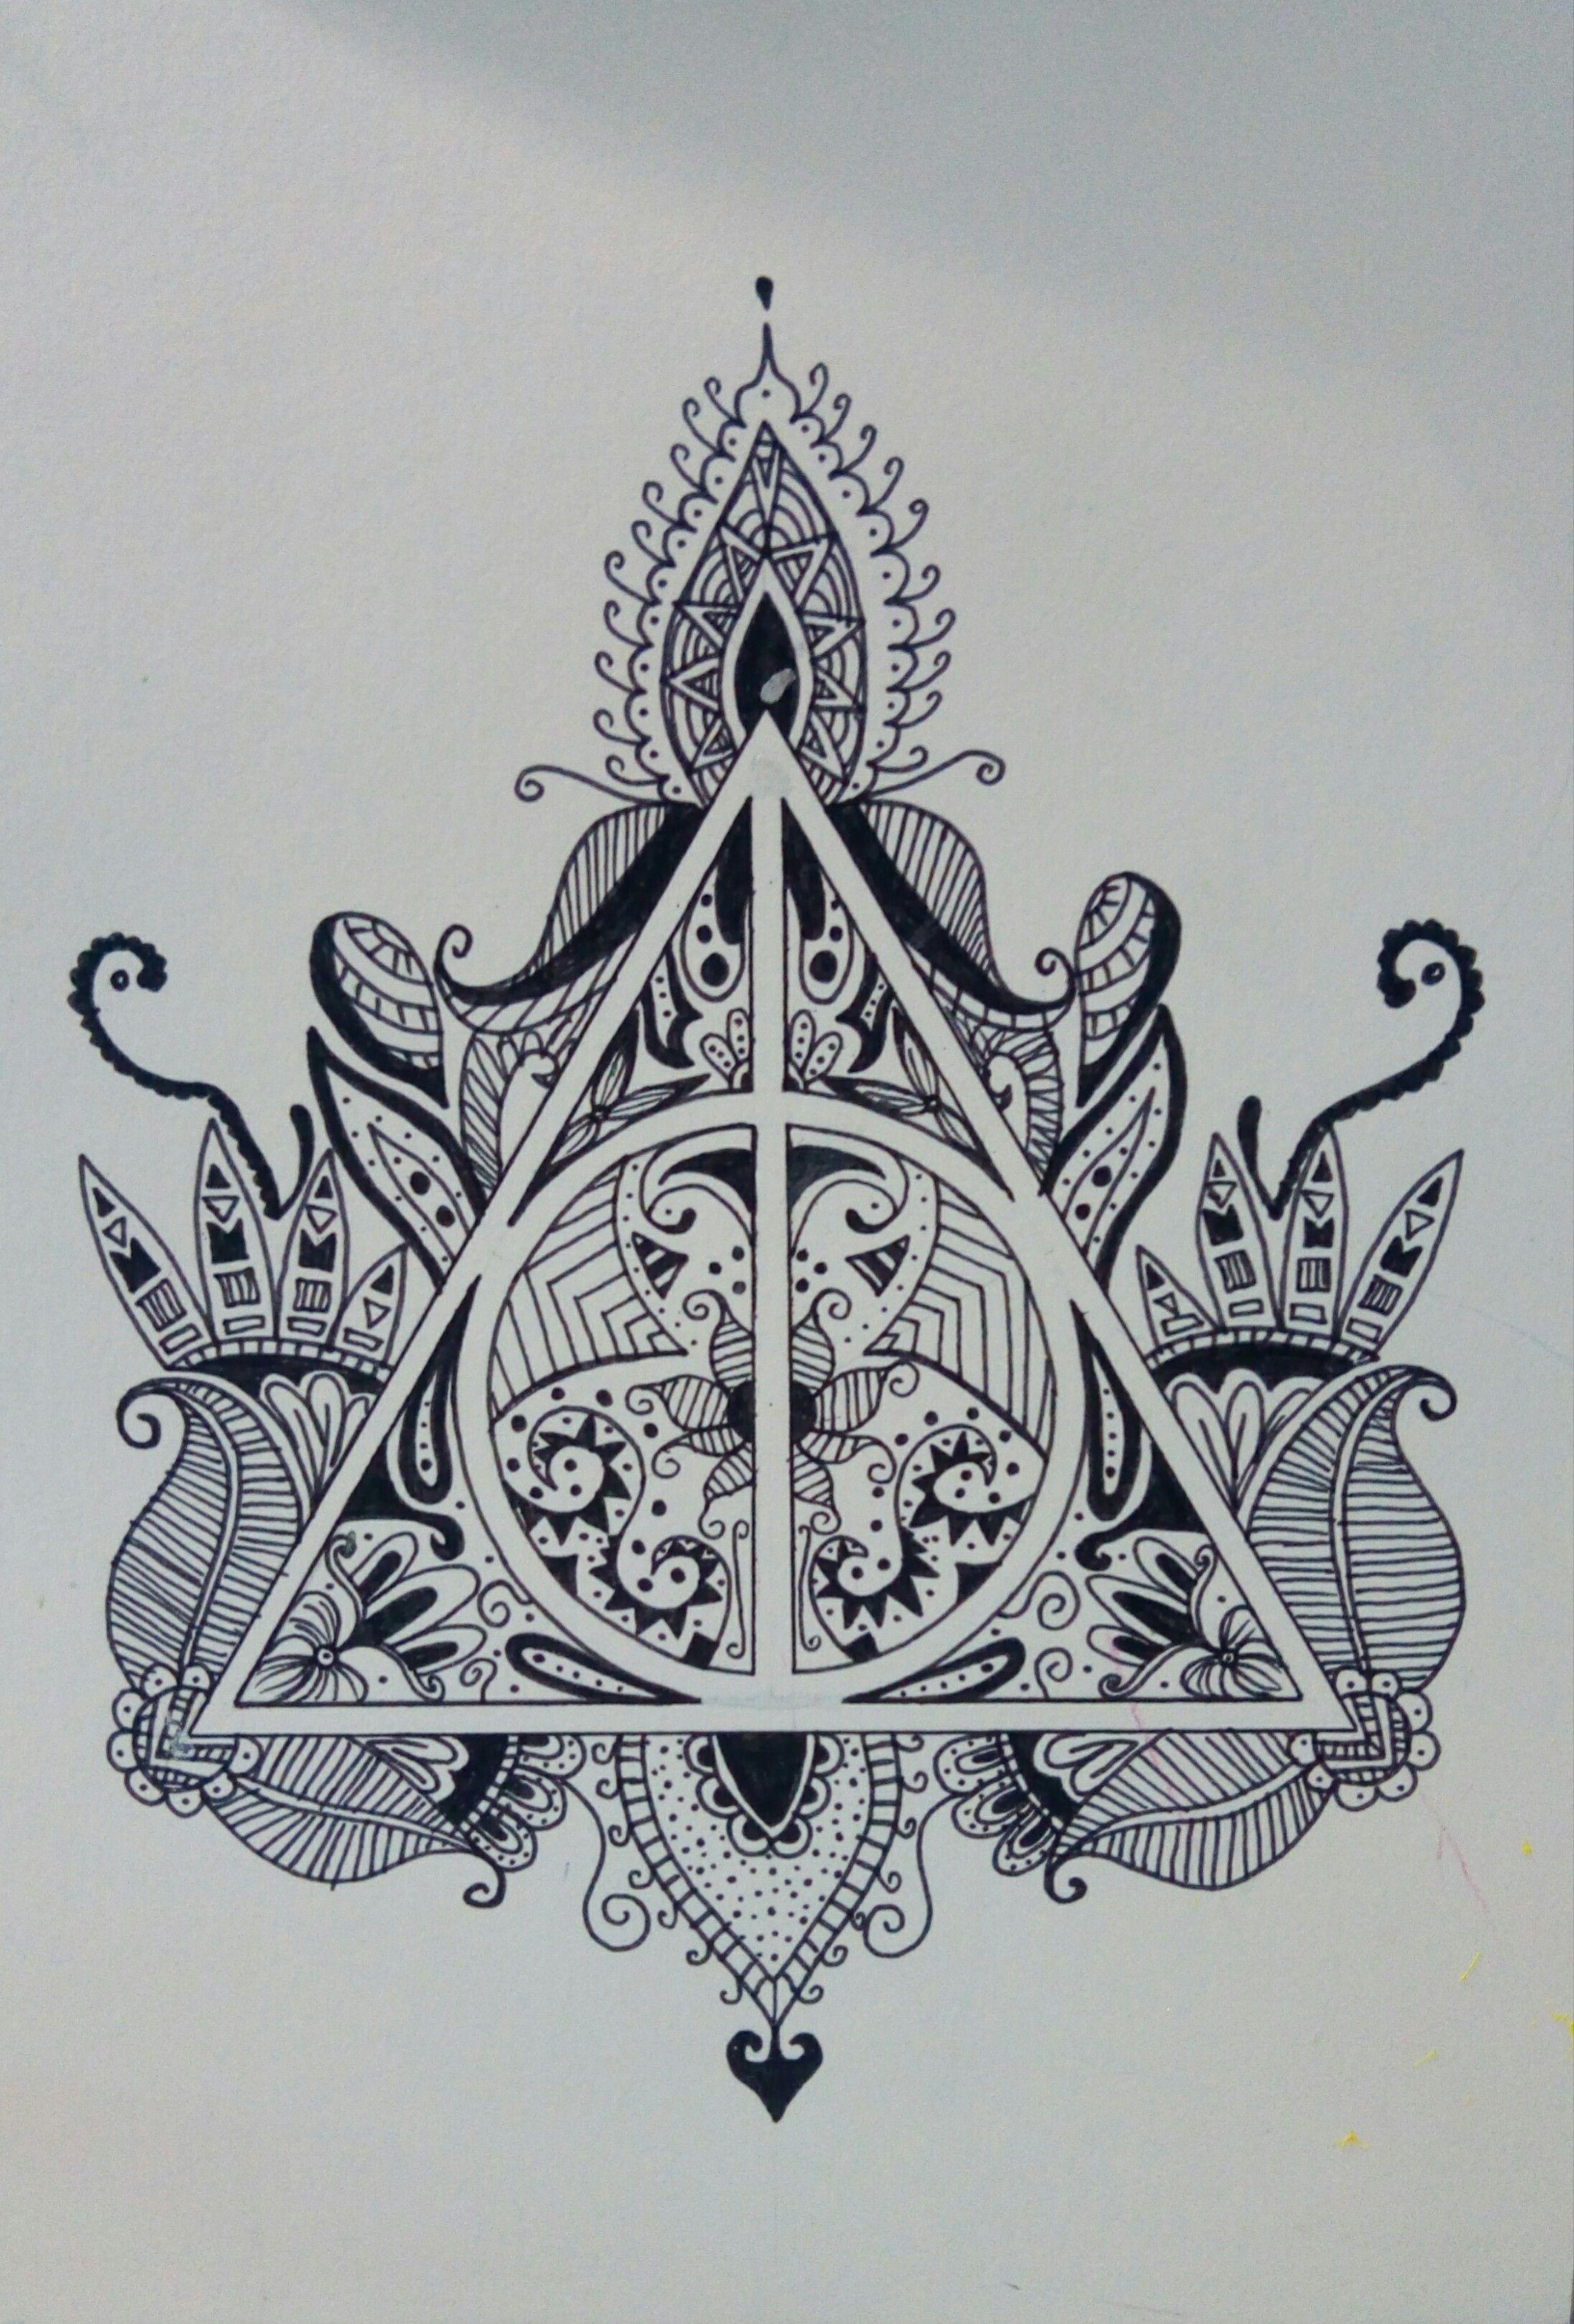 Dessin au feutre noir harry potter mandala tattoo ideas harry potter tattoos harry potter - Dessin mandela ...